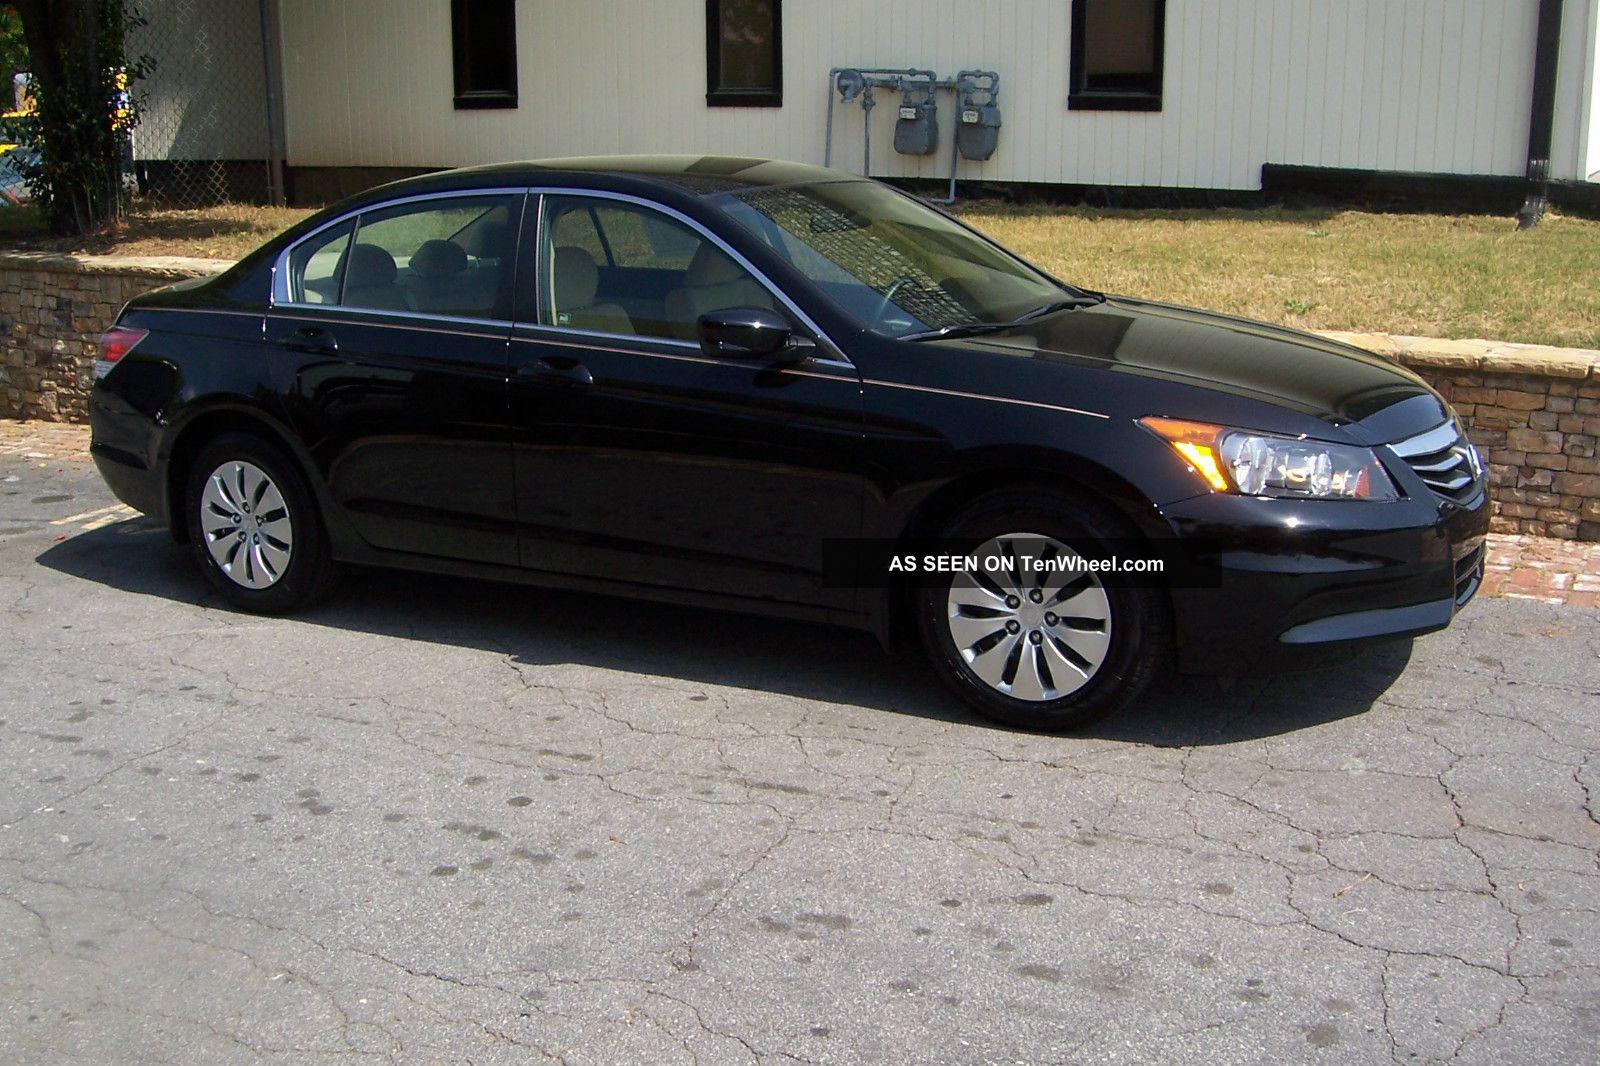 2011 Honda Accord Lx Sedan 4 Door 2 4l Only 14k